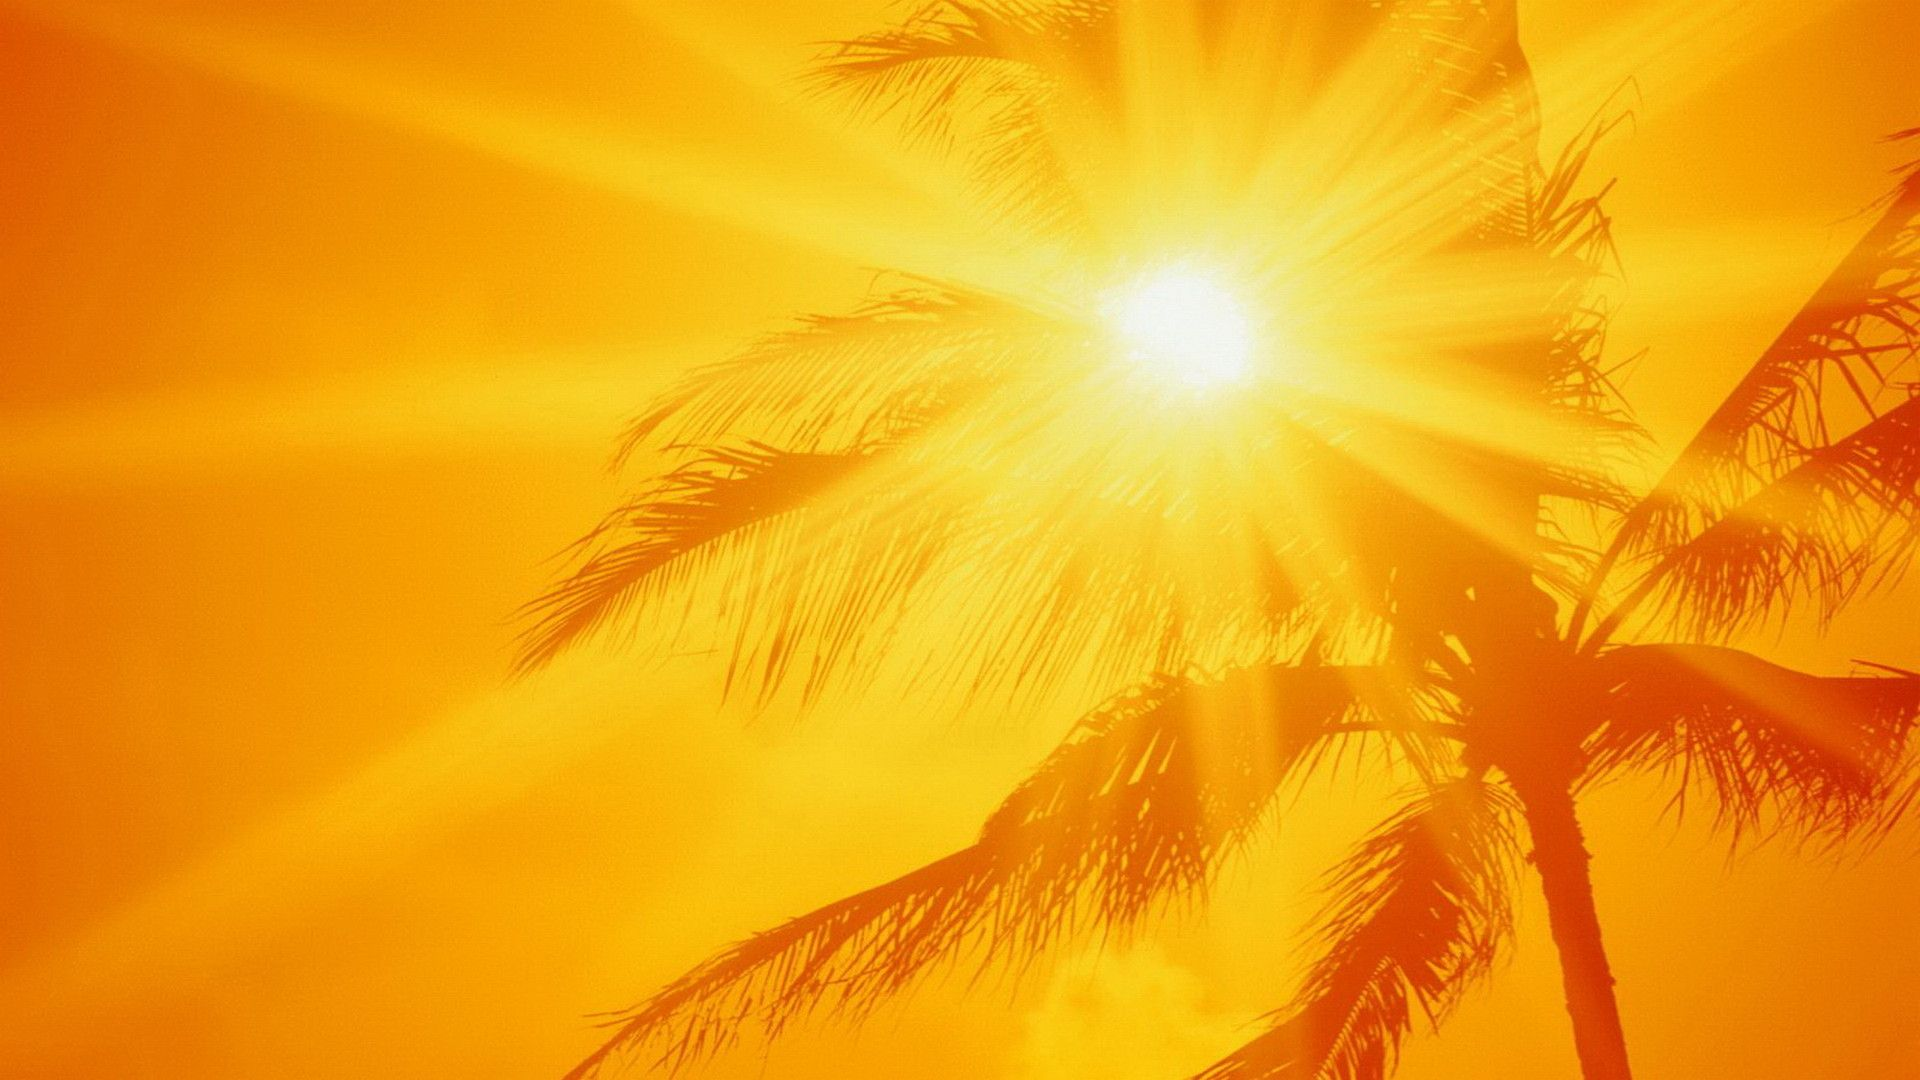 Hot Summer Time Golden Sky Beautiful Nature Landscapes Desktop Wallpapers Awsome Landscape Wallpa Sunshine Wallpaper Summer Wallpaper Tree Wallpaper Iphone